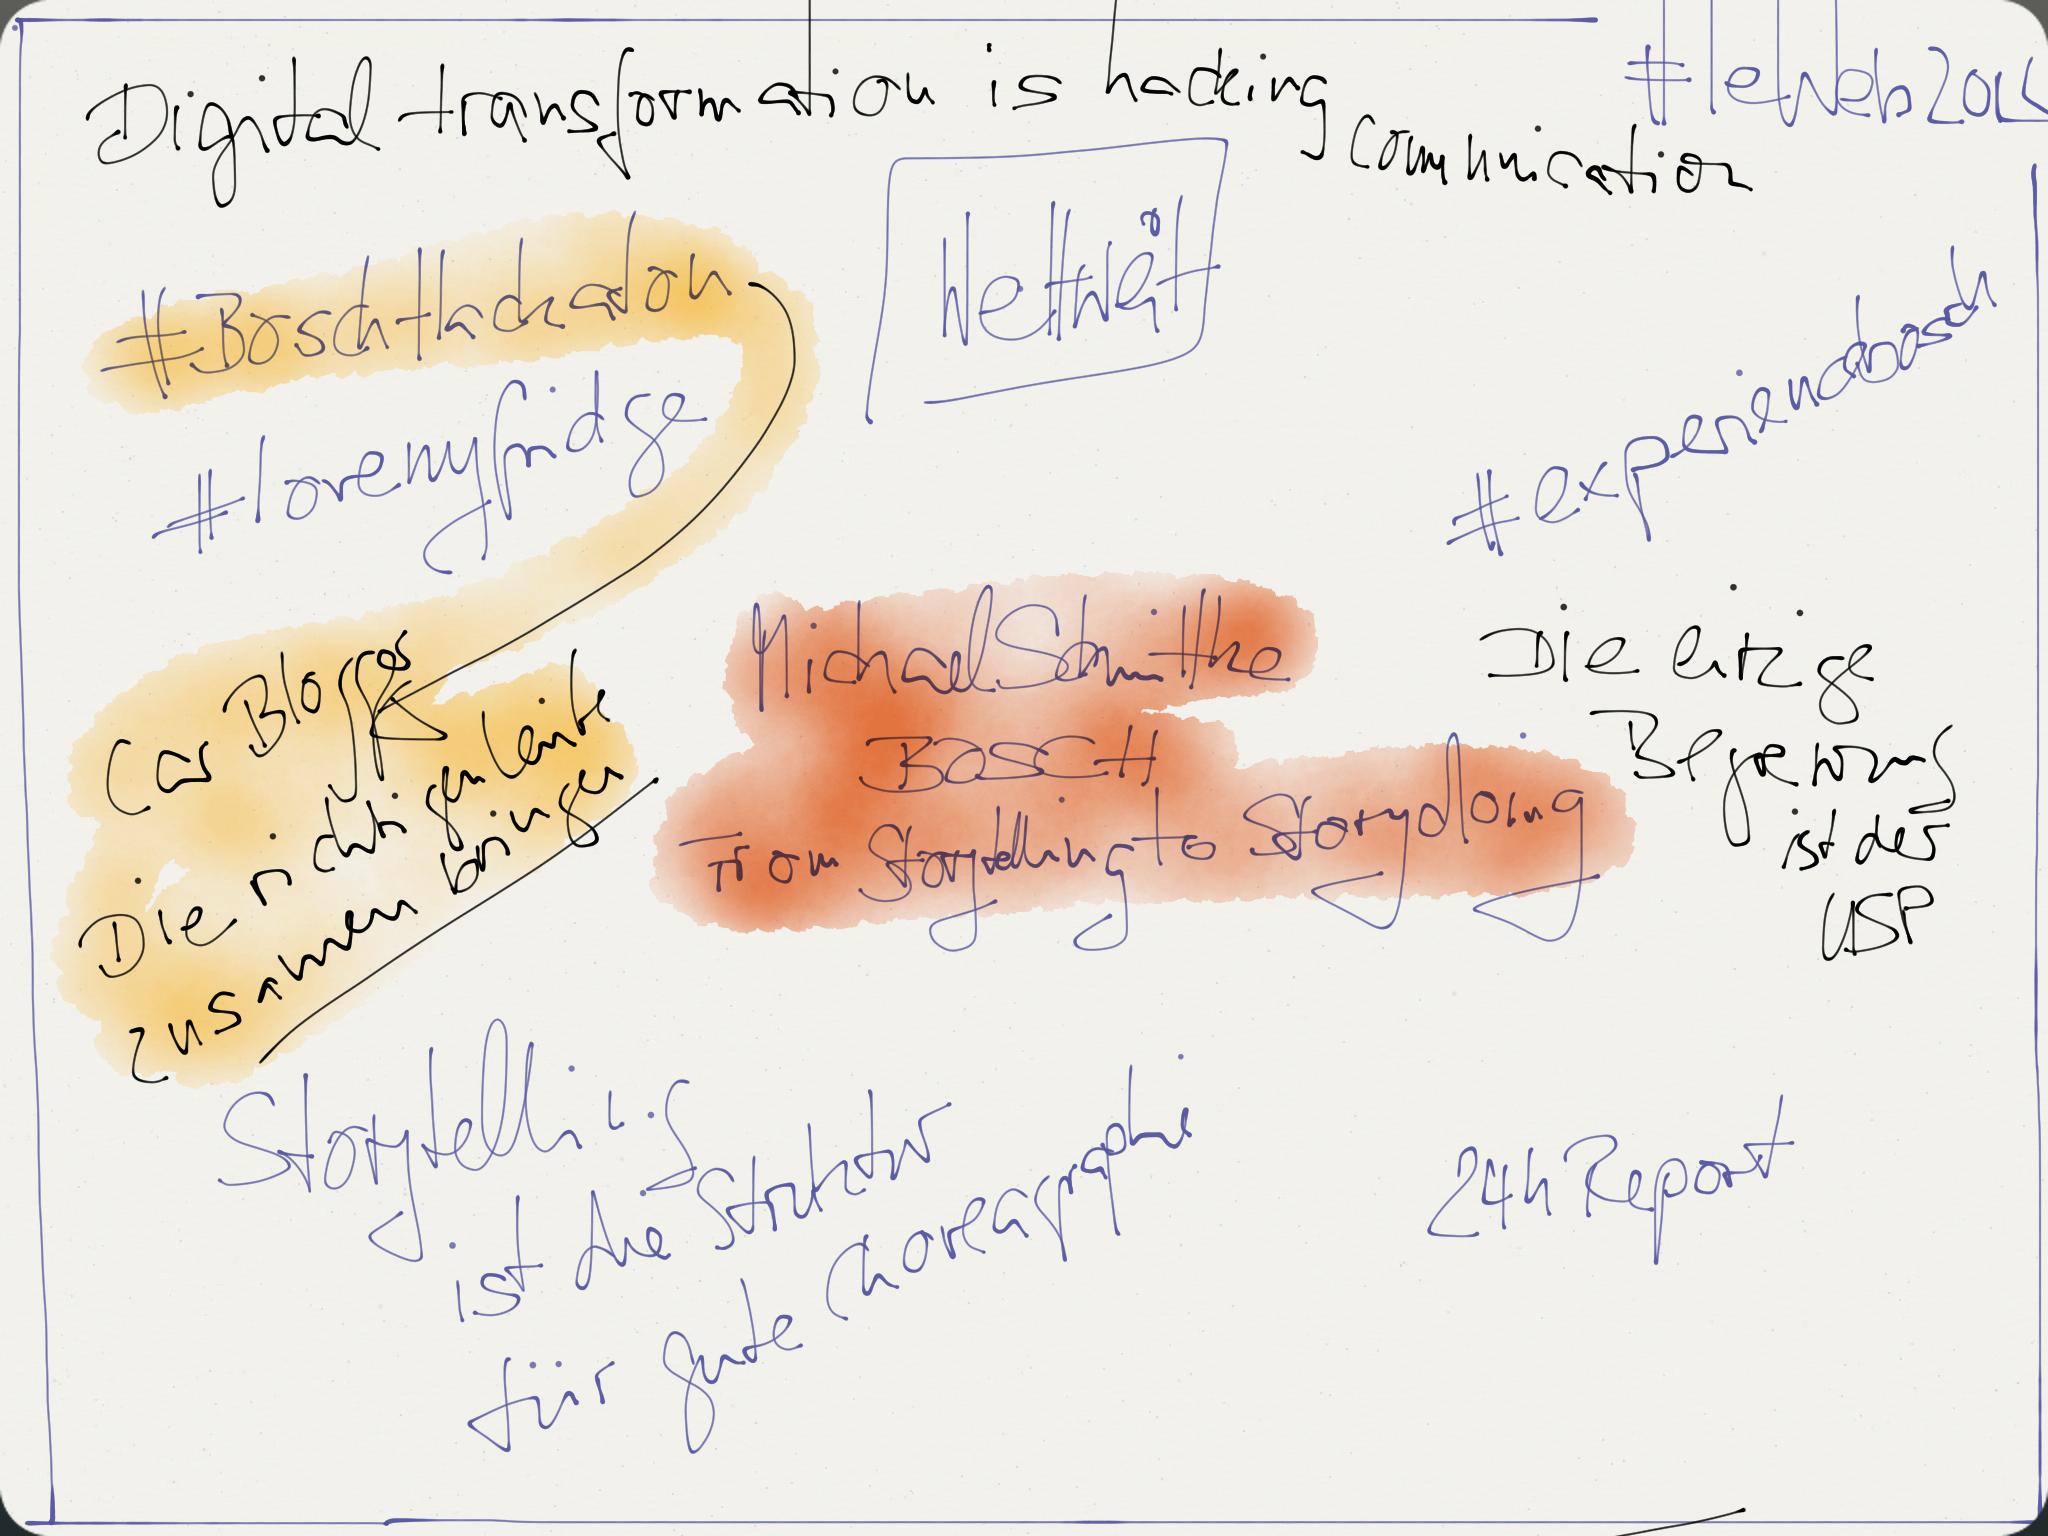 Mitschrift Michael Schmitke, Bosch, LeWeb2014